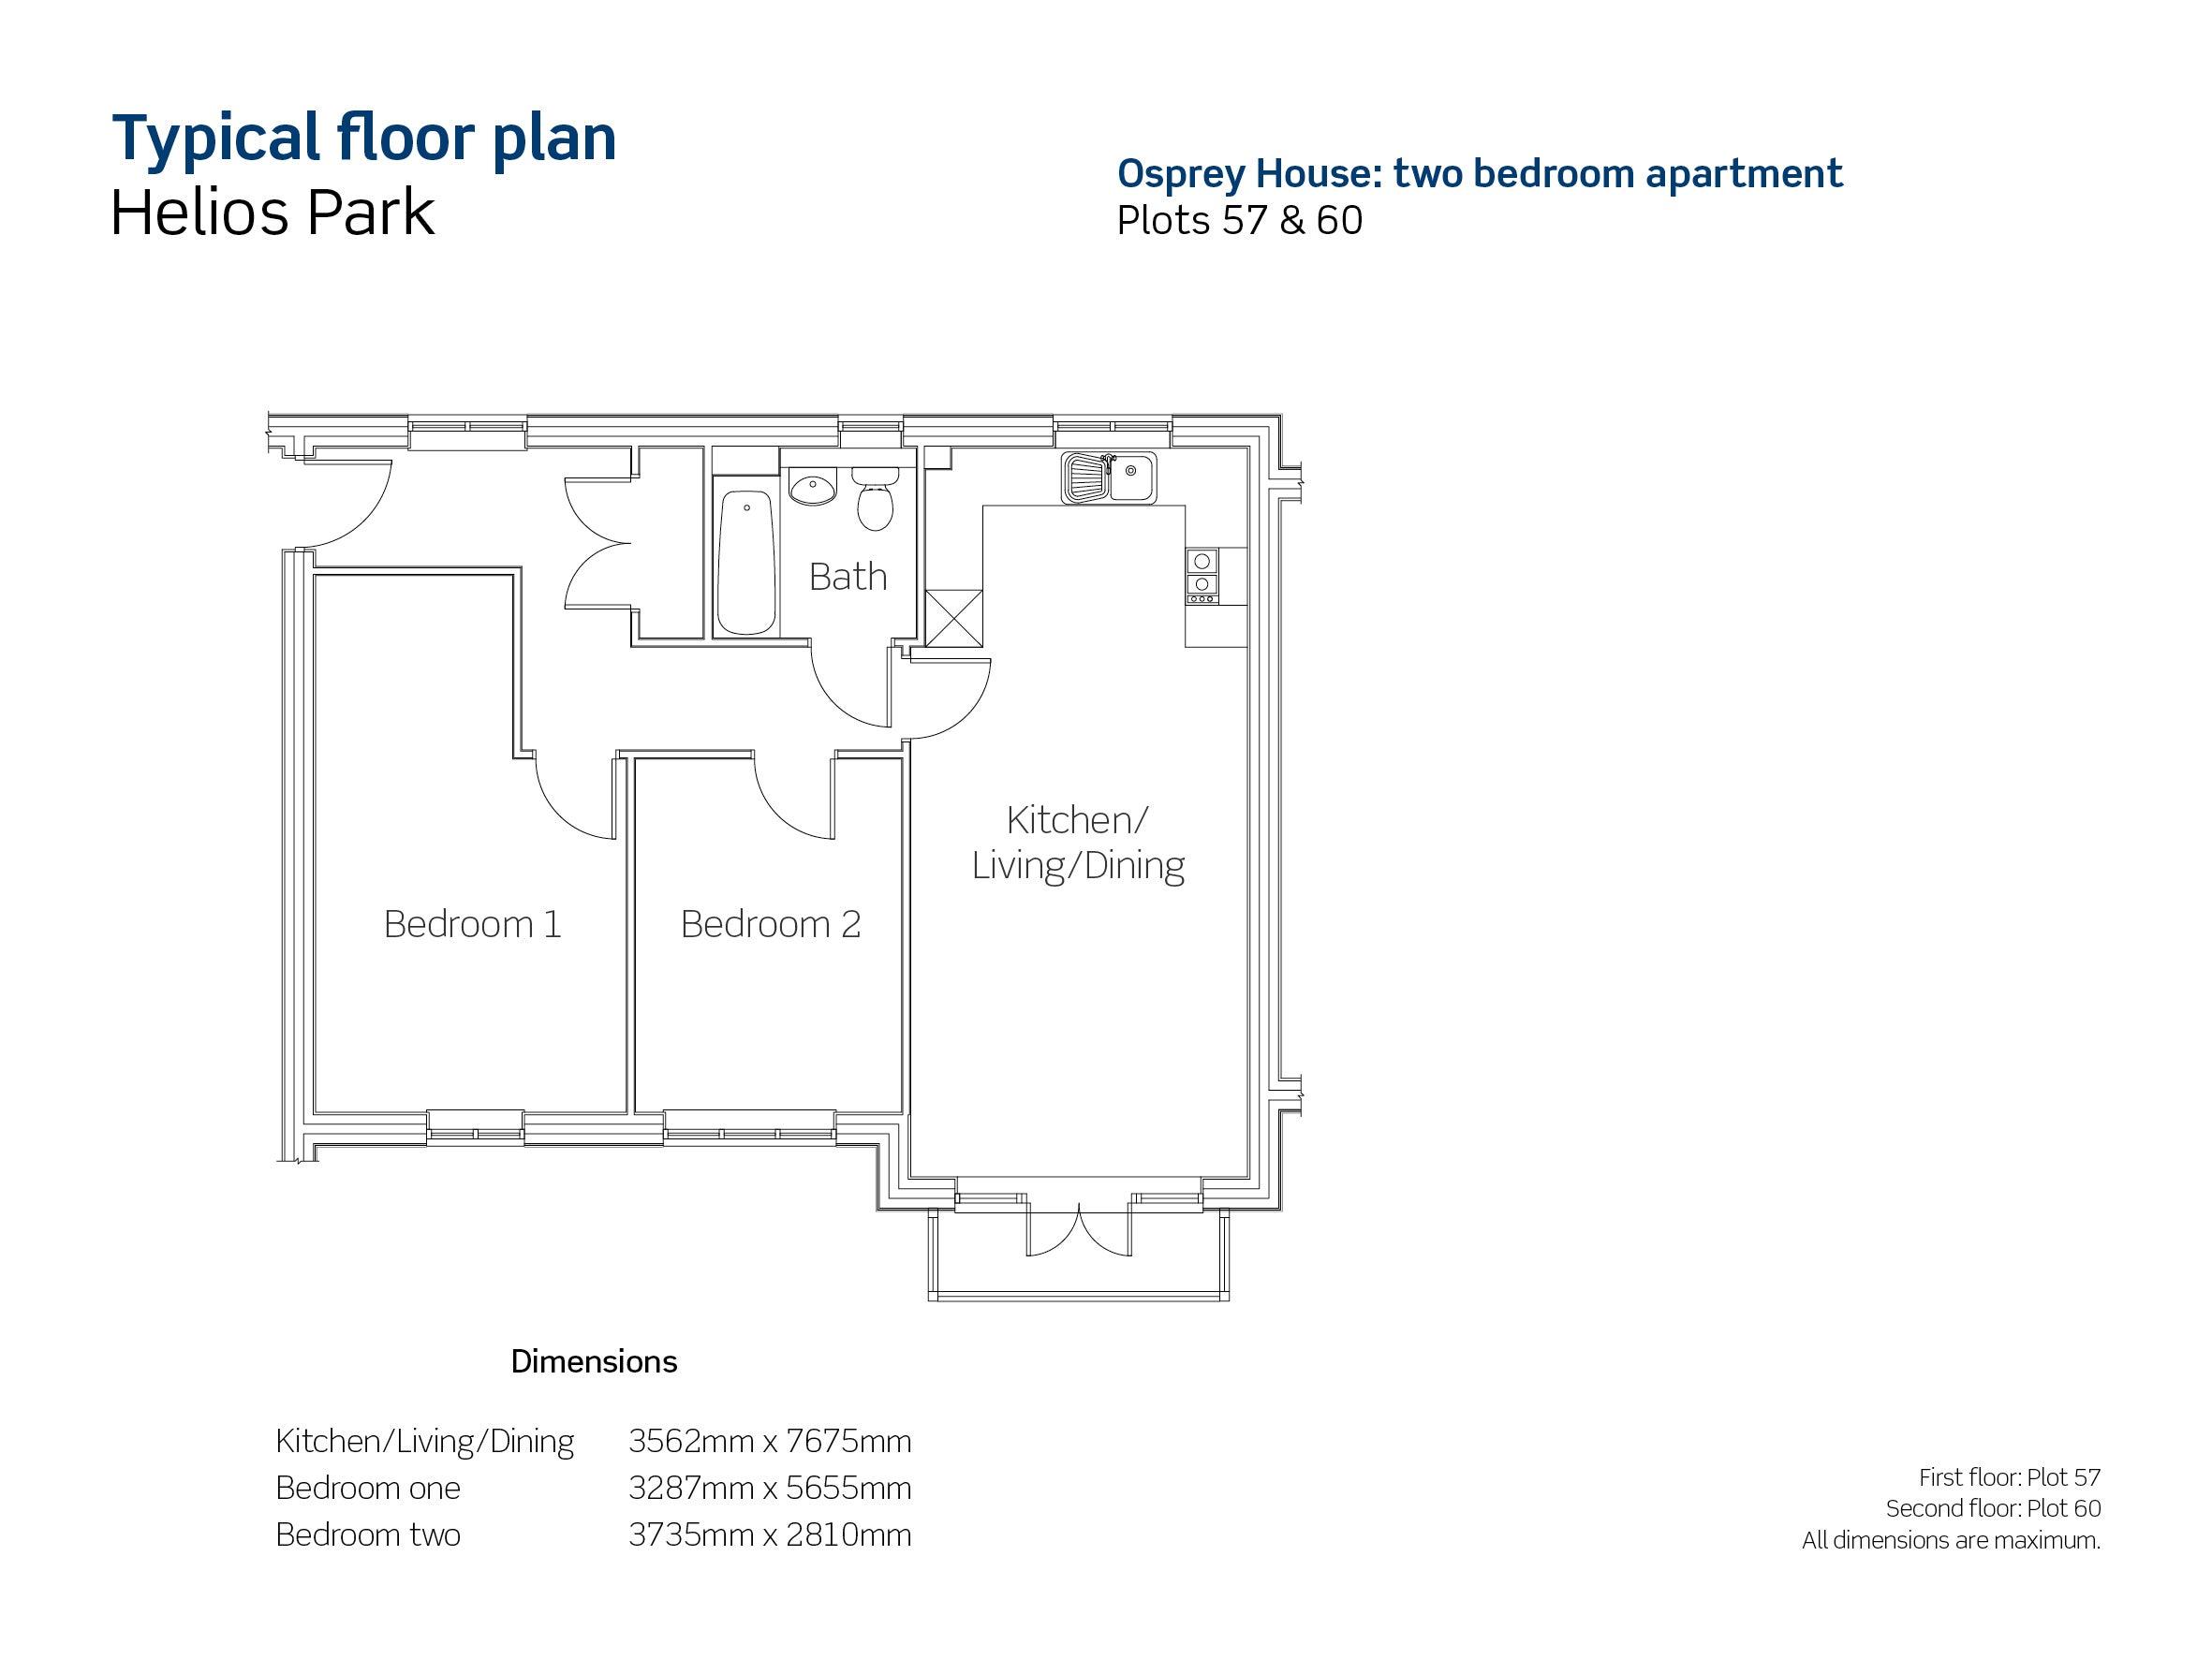 Helios Park plot 57 floor plan